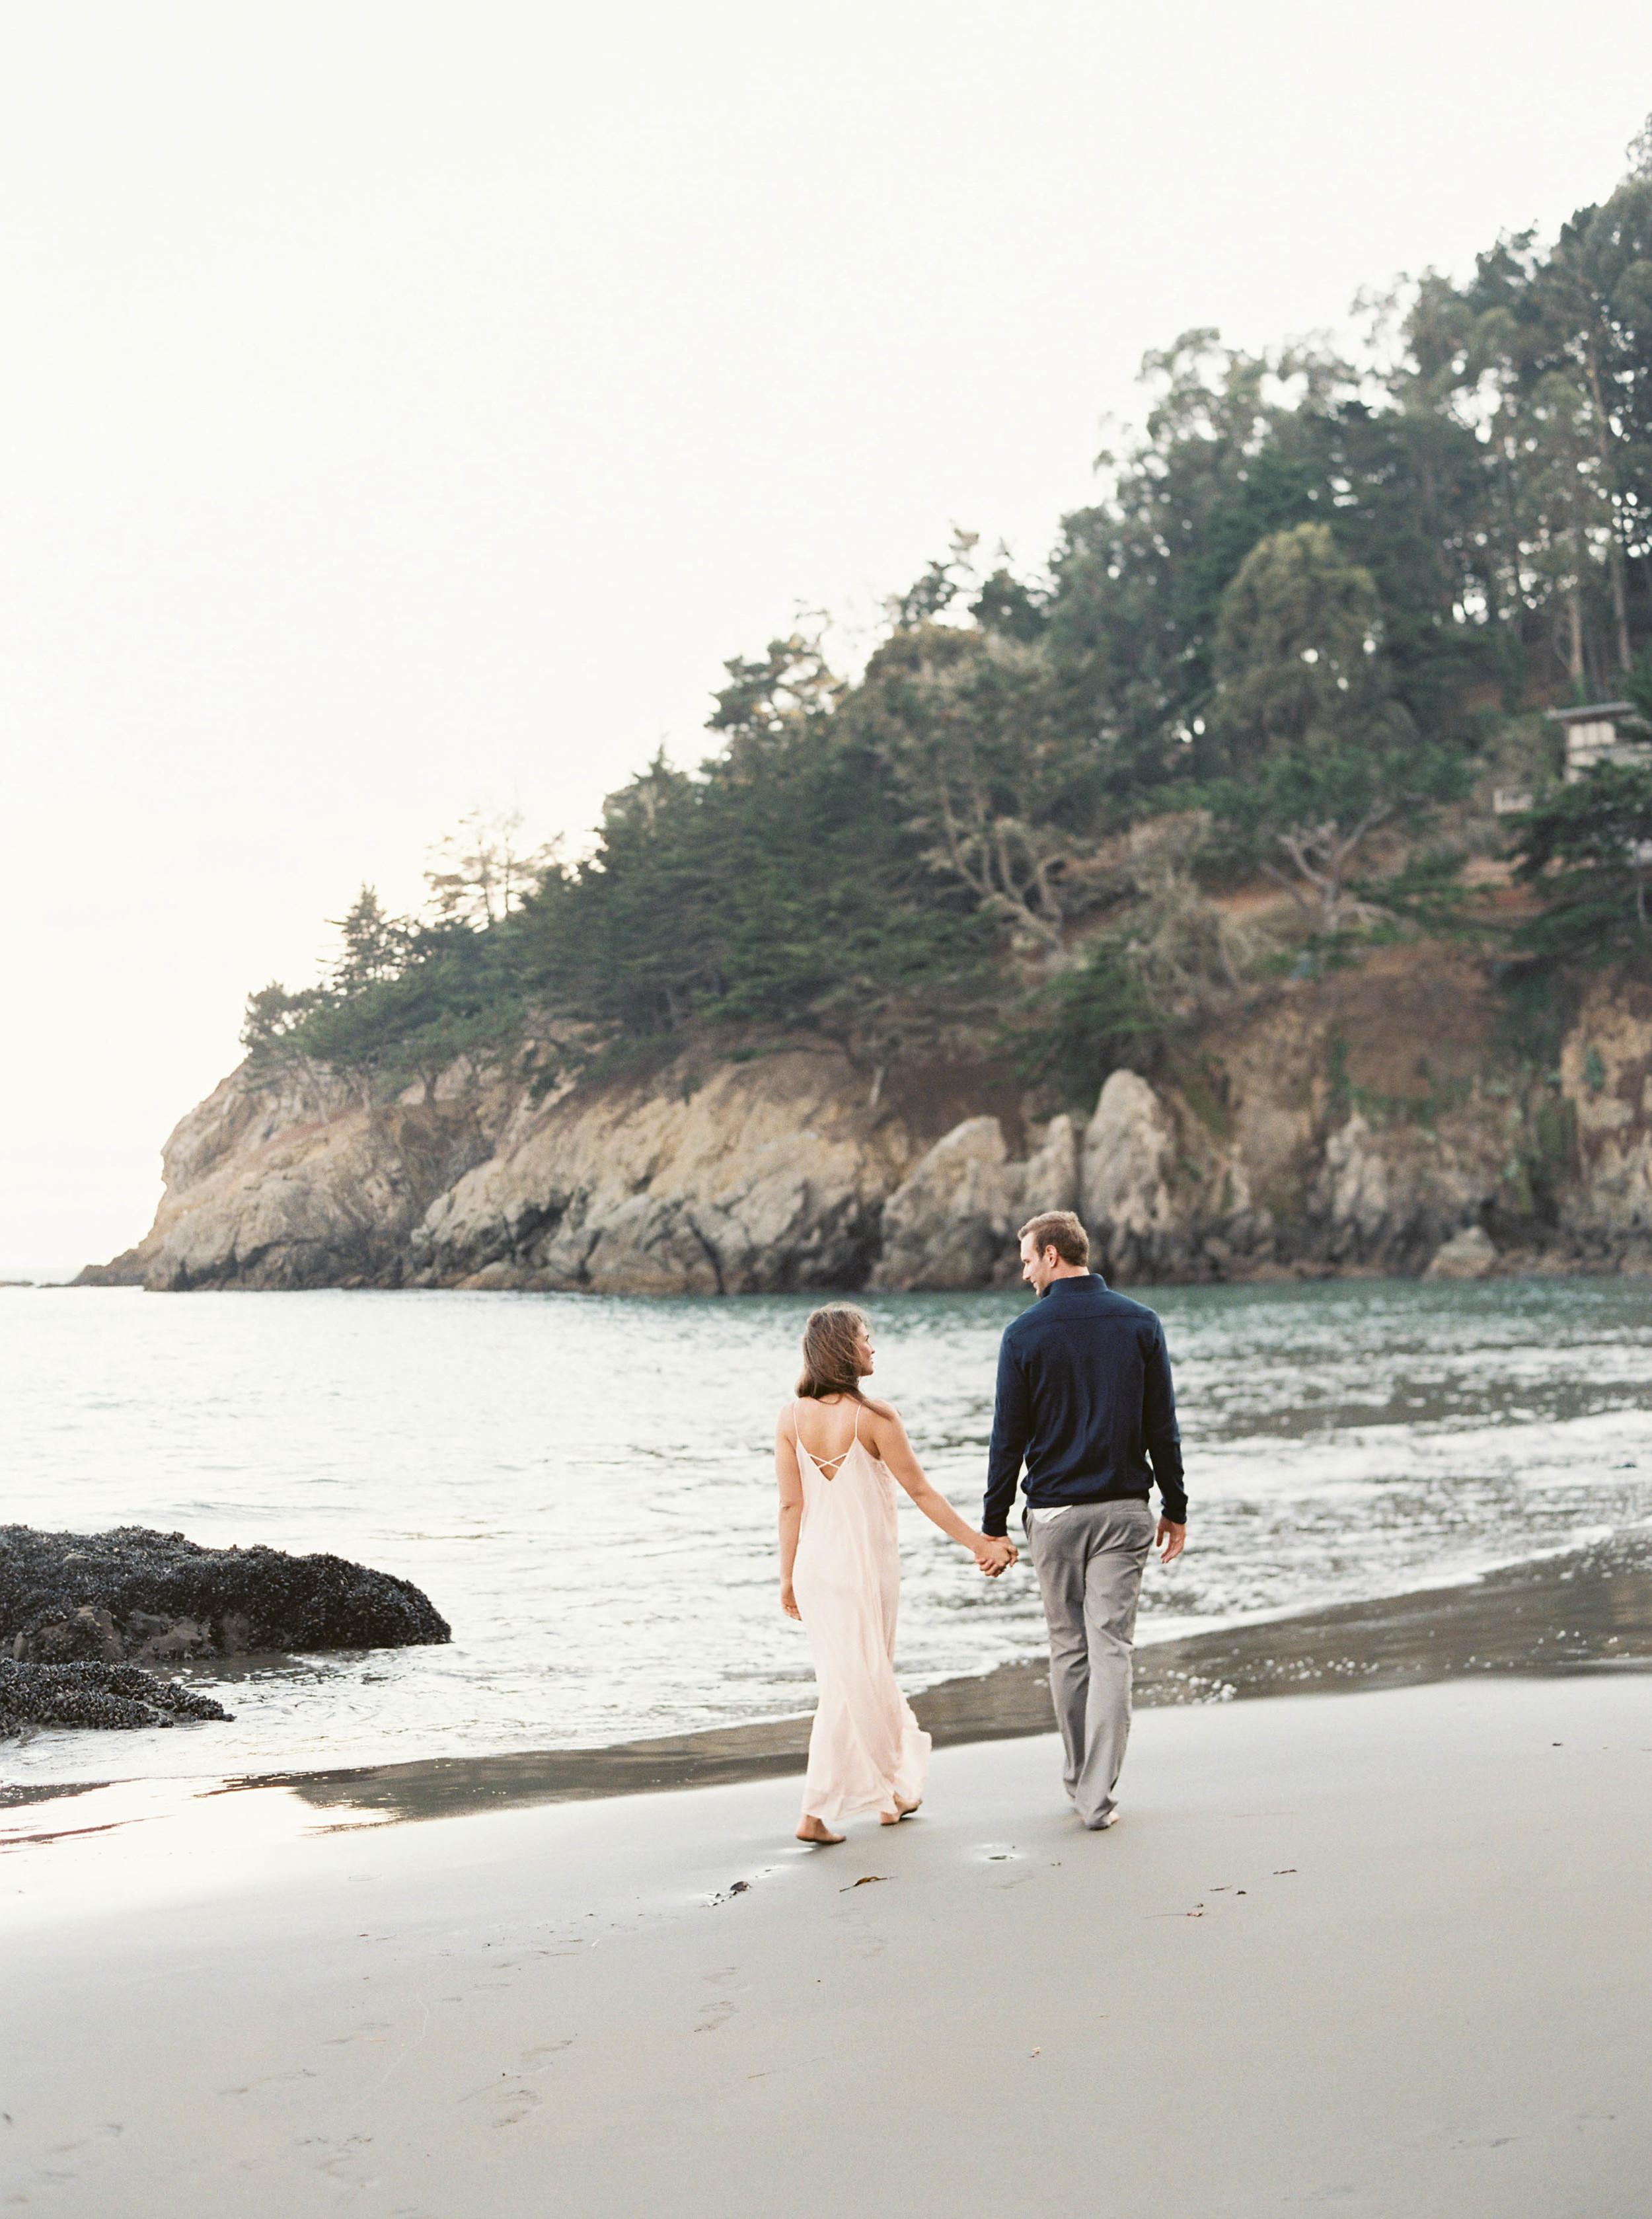 Meghan Mehan Photography - Fine Art Film Wedding Photography - San Francisco | Napa | Sonoma | Big Sur | Santa Barbara - 104.jpg